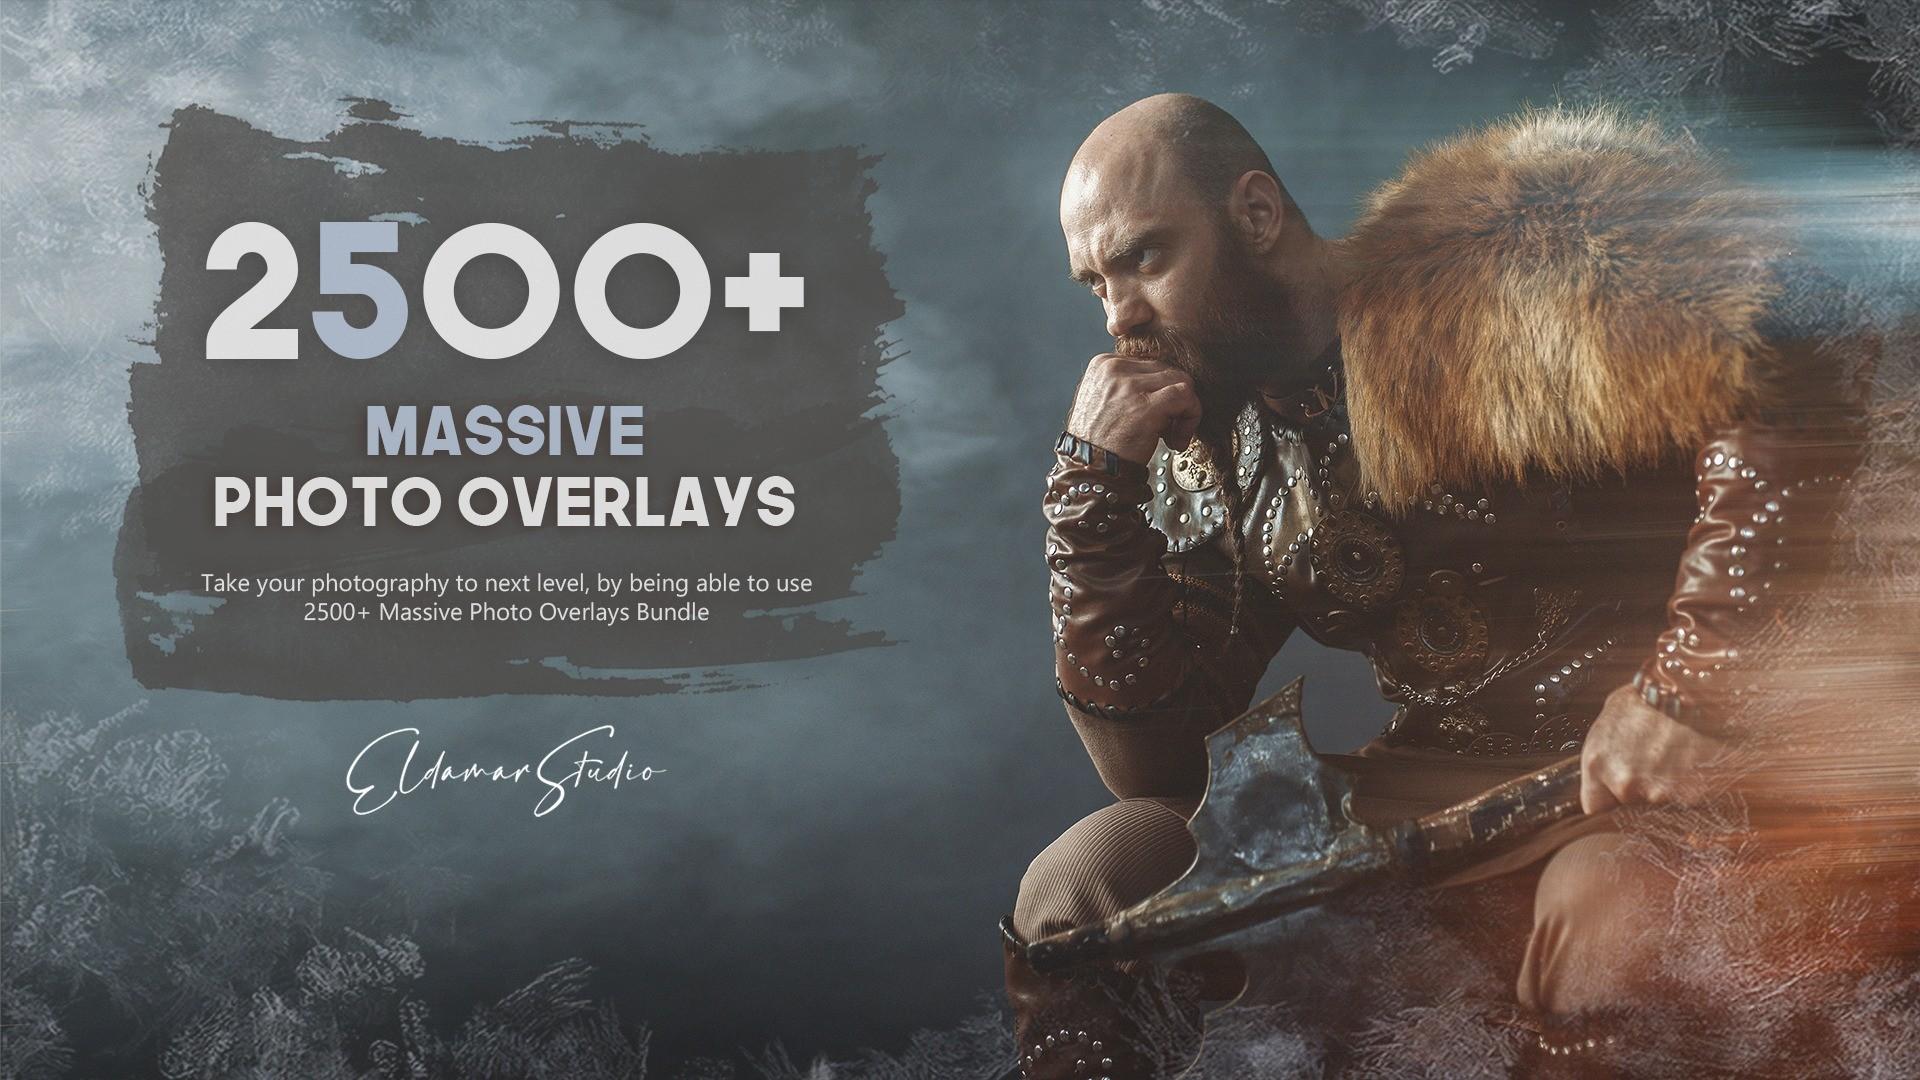 AppSumo Deal for 2500+ Massive Photo Overlays Bundle